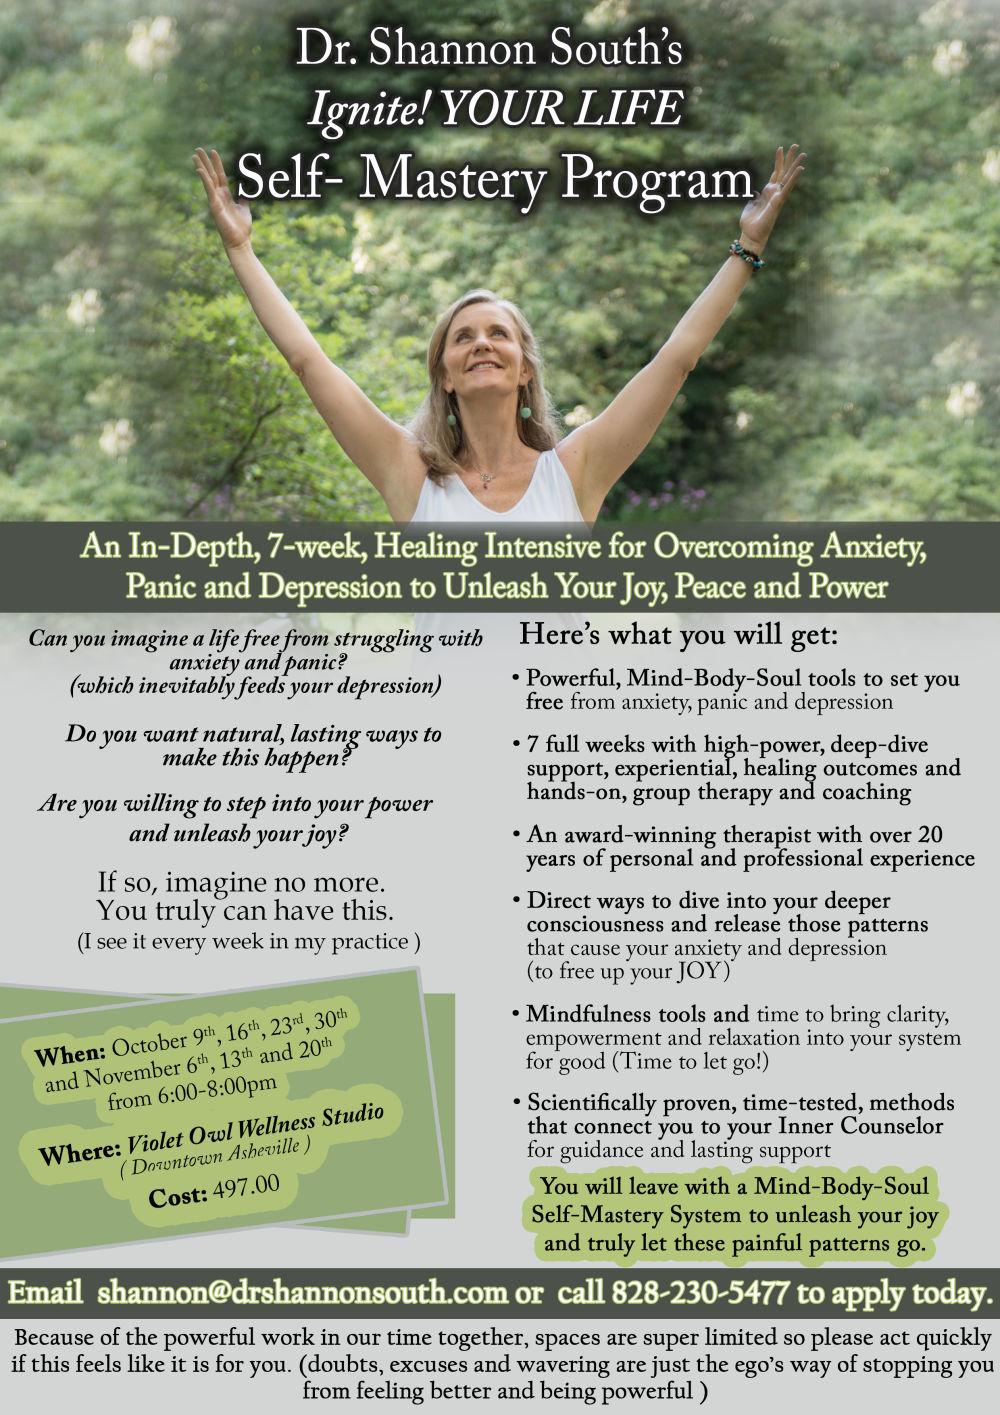 Ignite Your LIfe Self Mastery Program Flyer 2 edtion (1) (1)